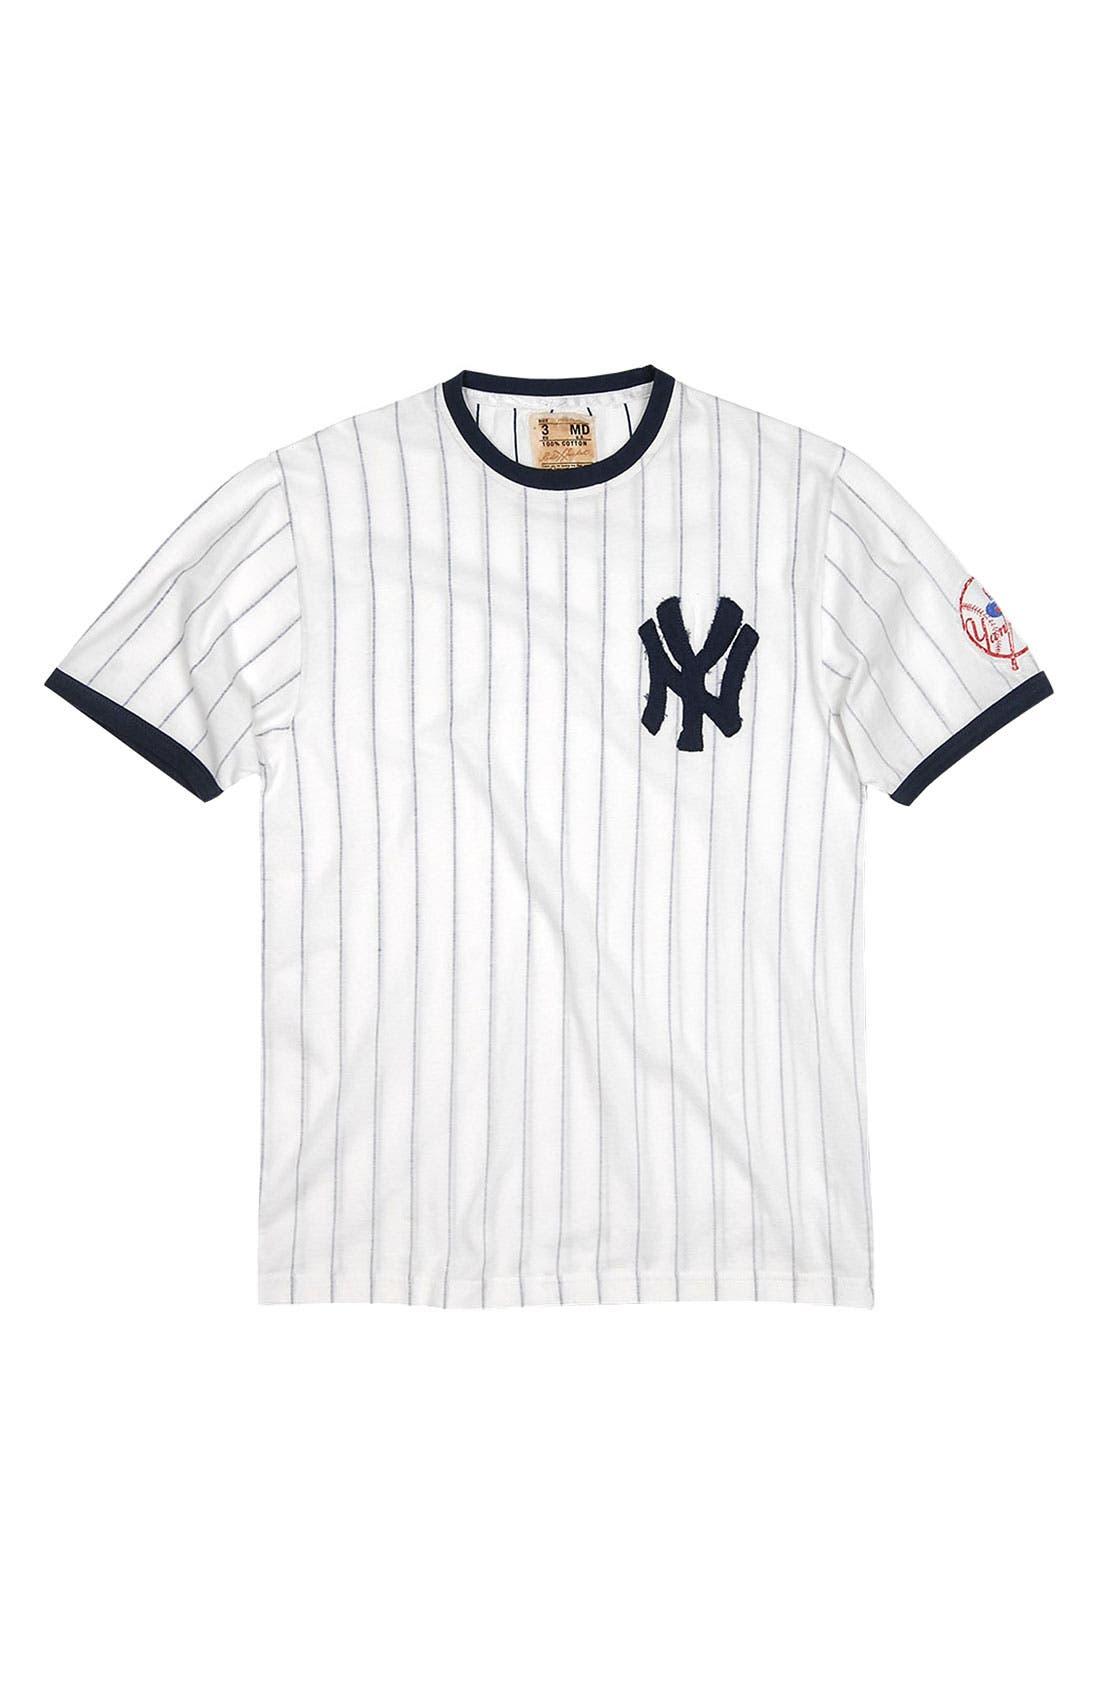 Alternate Image 4  - Red Jacket 'New York Yankees' Trim Fit Ringer T-Shirt (Men)